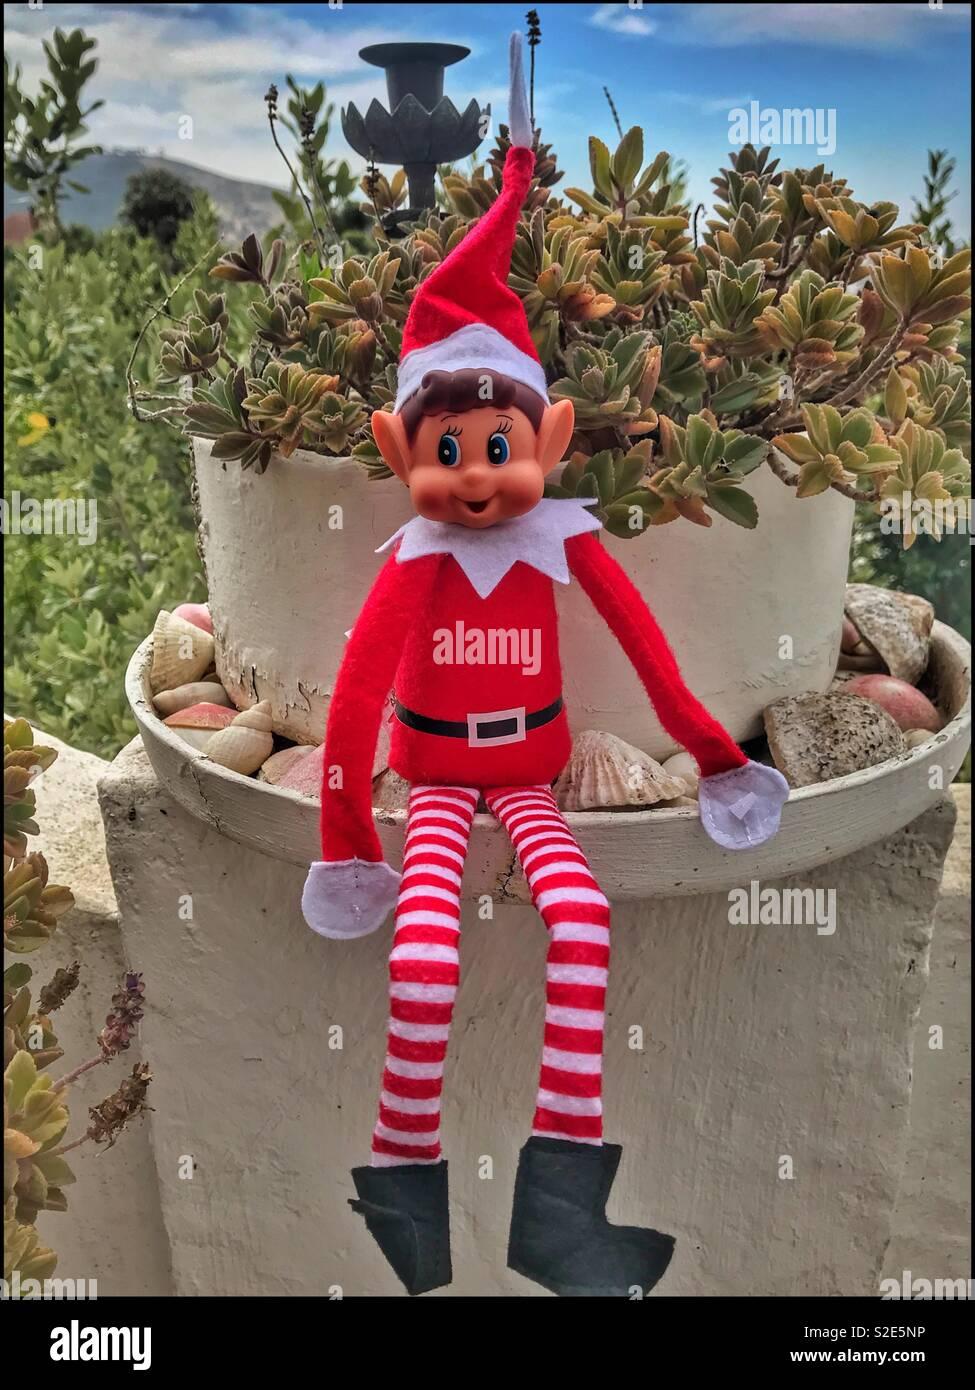 Naughty elf sitting on a pot plant. Stock Photo